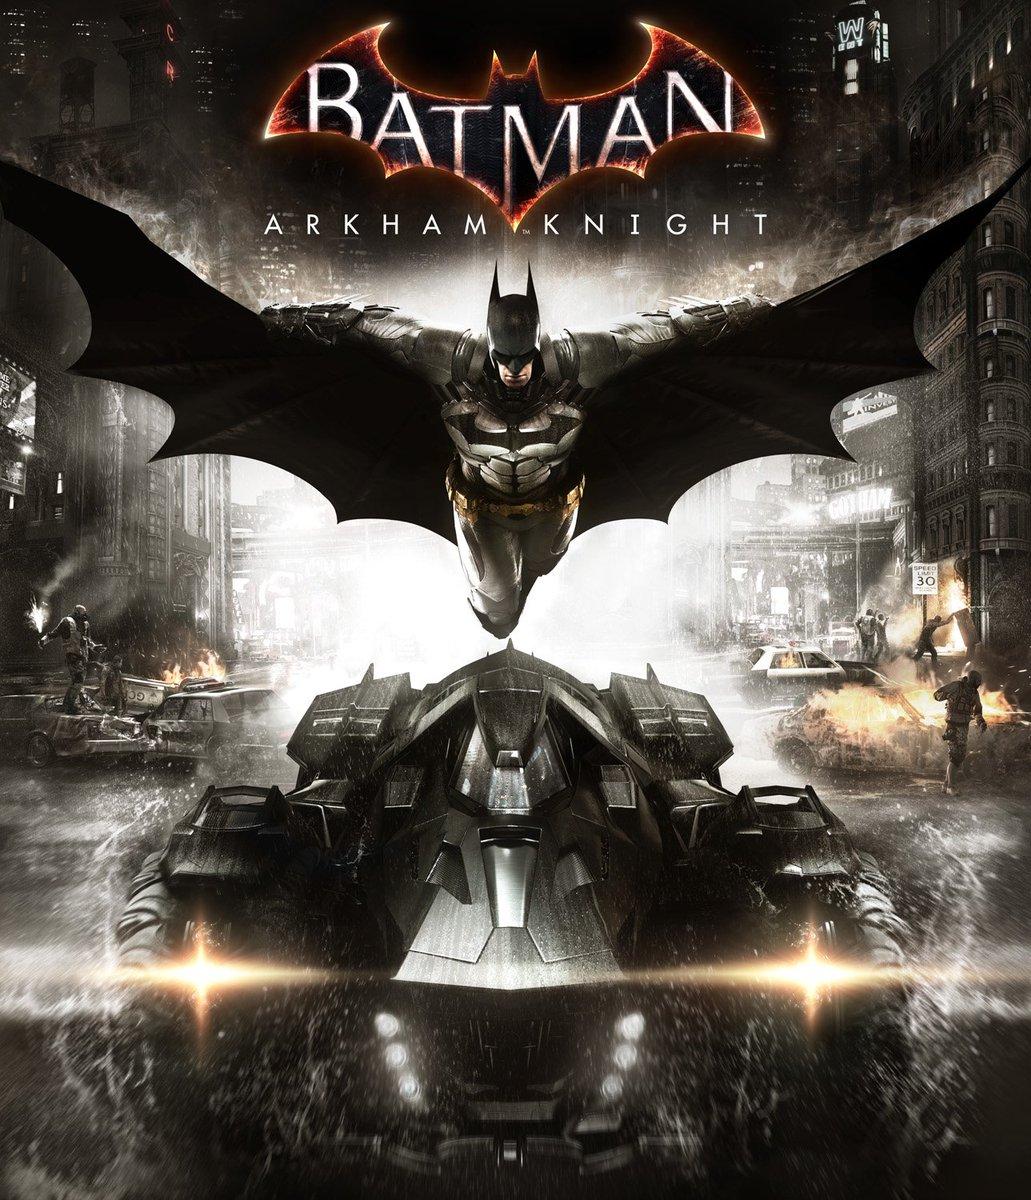 Batman Arkham Batmanarkham Twitter Return To Asylum Reg 3 Ps4 854 Replies 2622 Retweets 13483 Likes